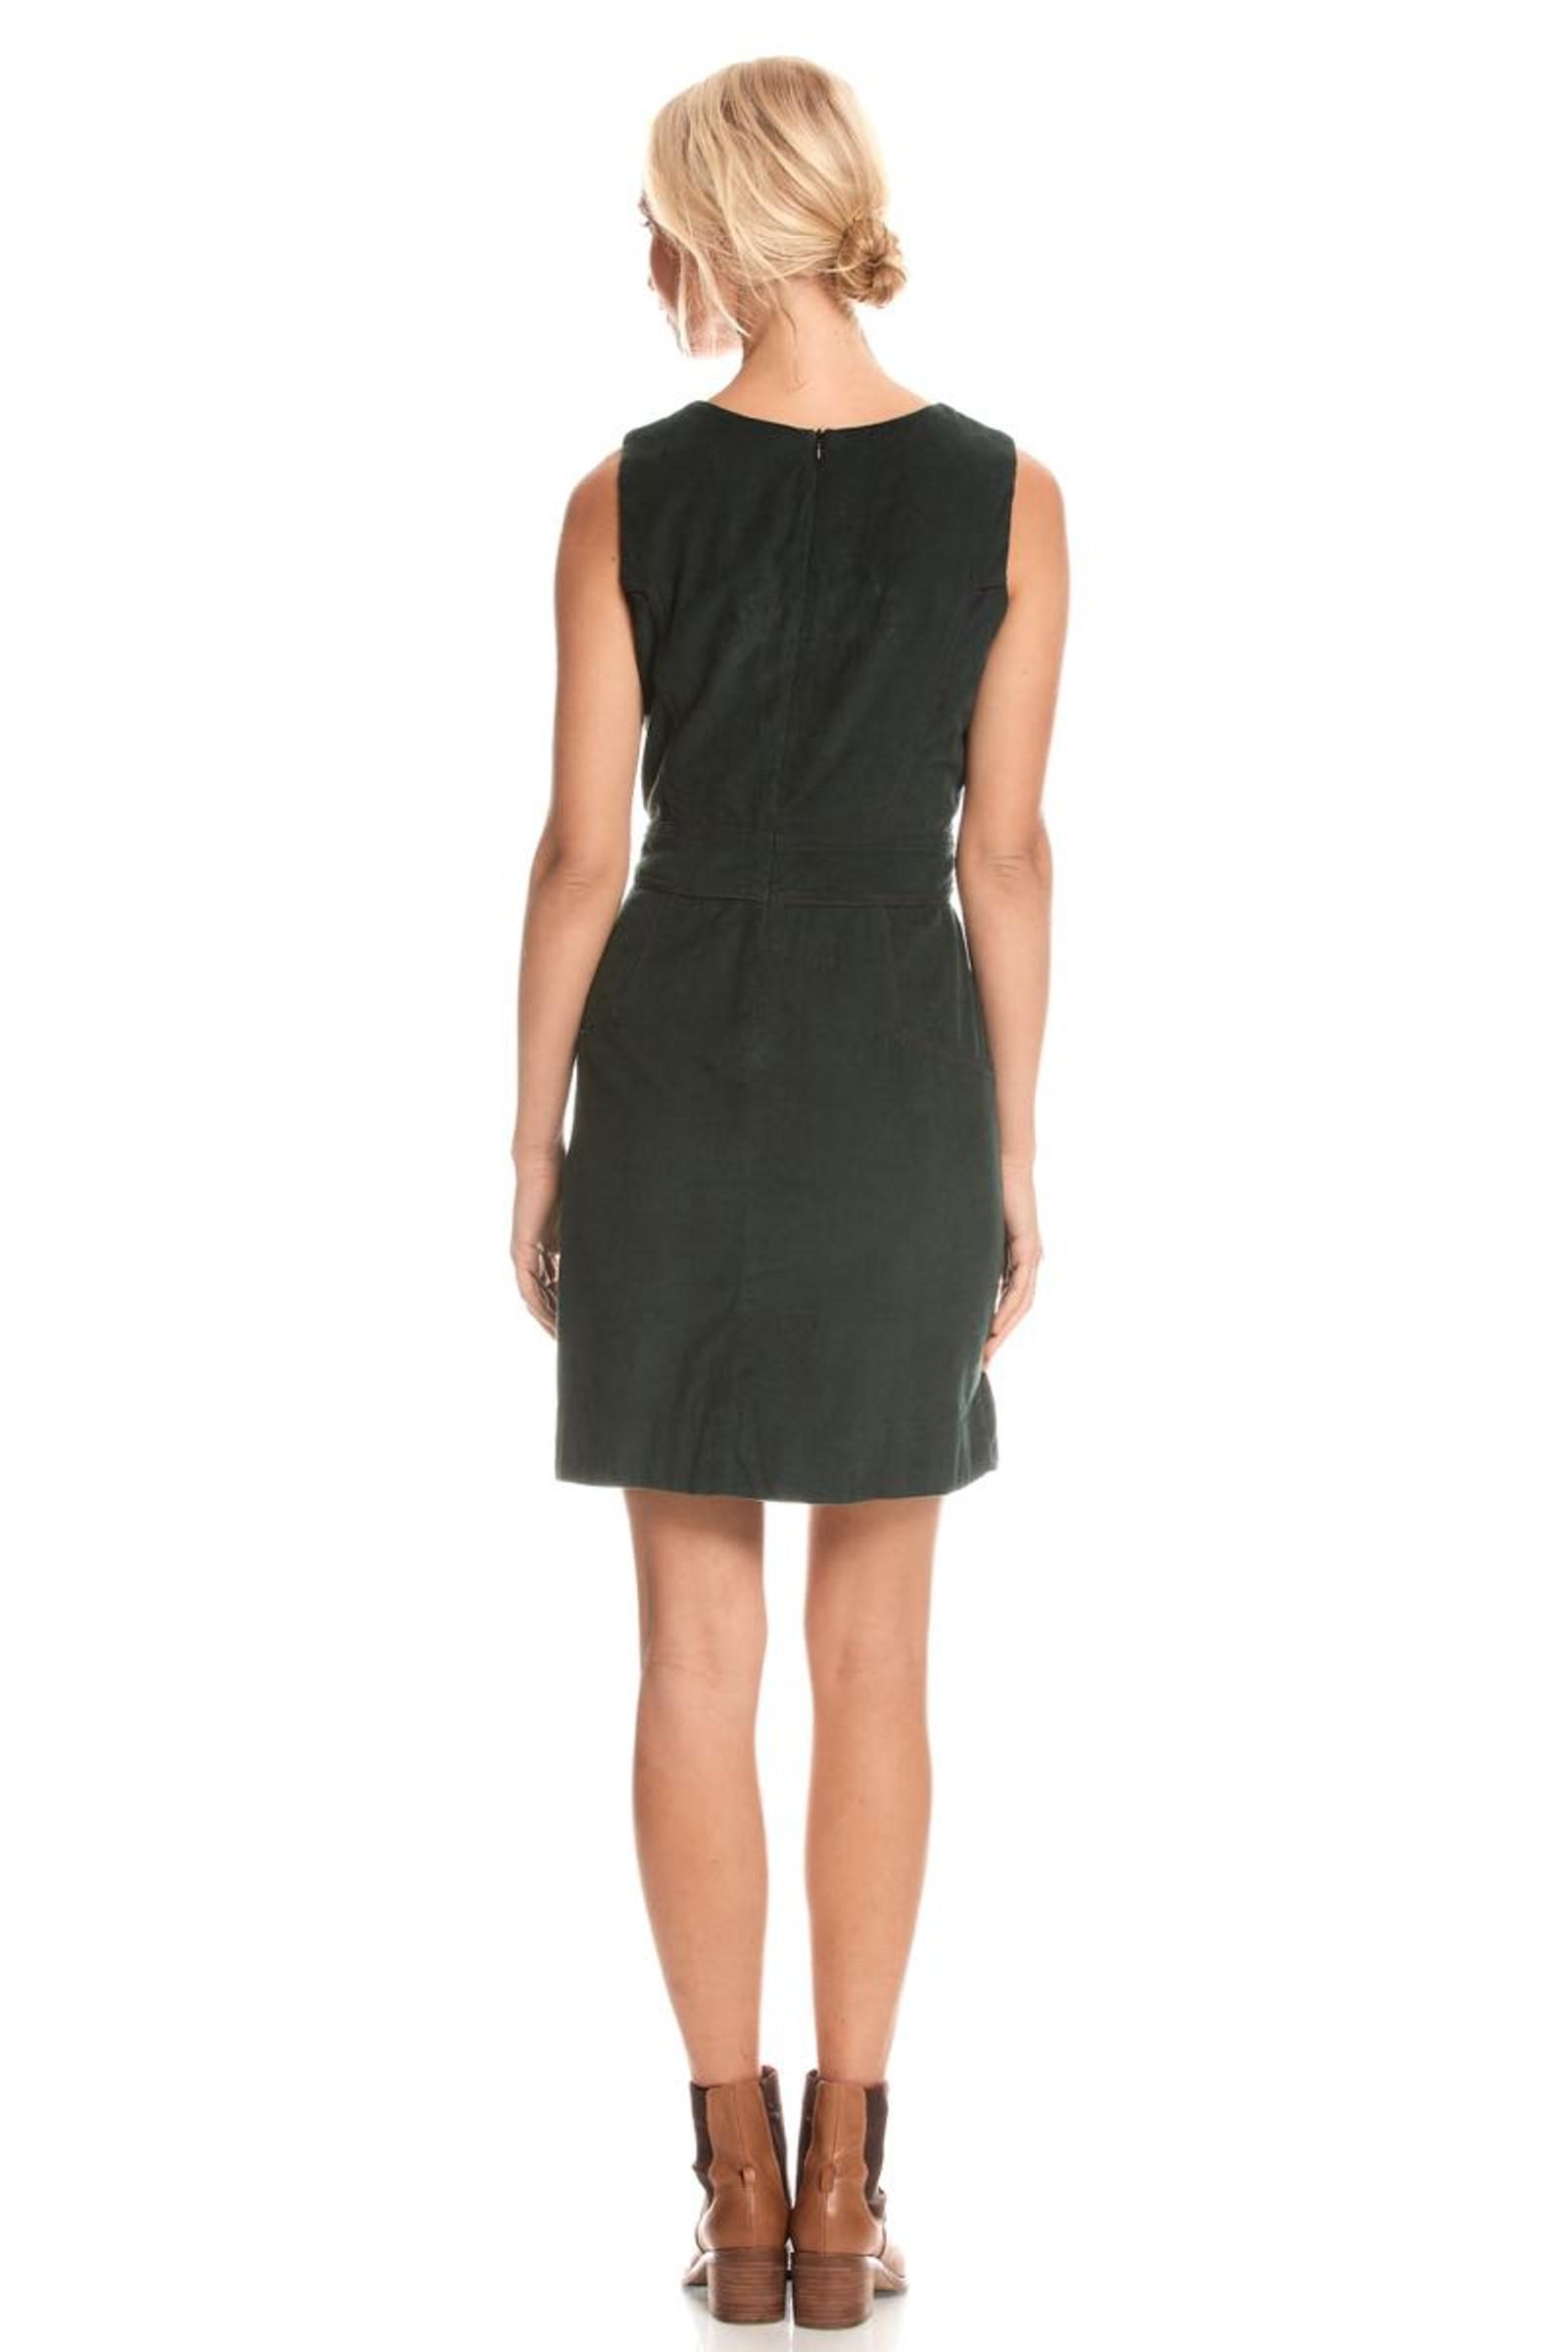 Abby Dress Corduroy - Emerald